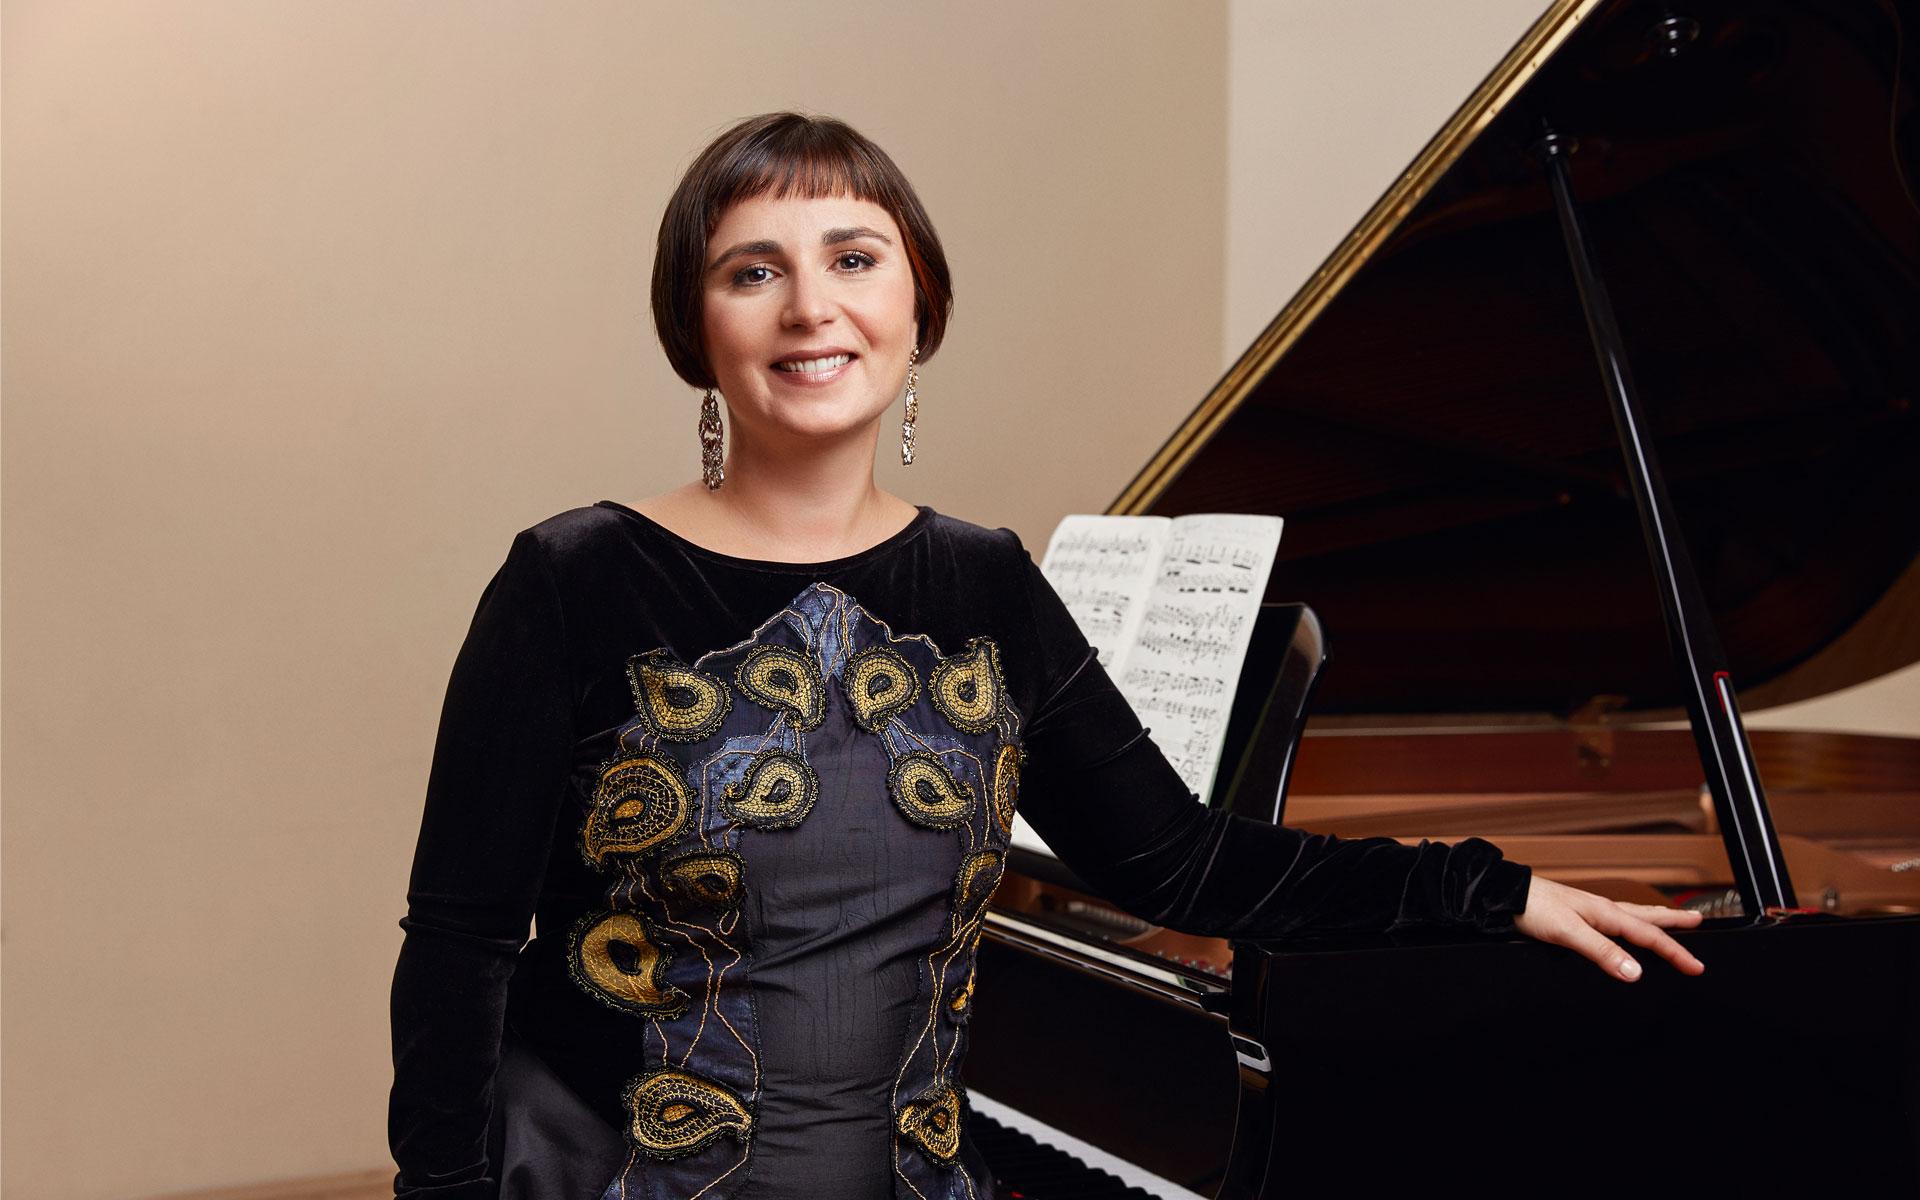 Startbild Natali Pavlovic steht vor dem Klavier